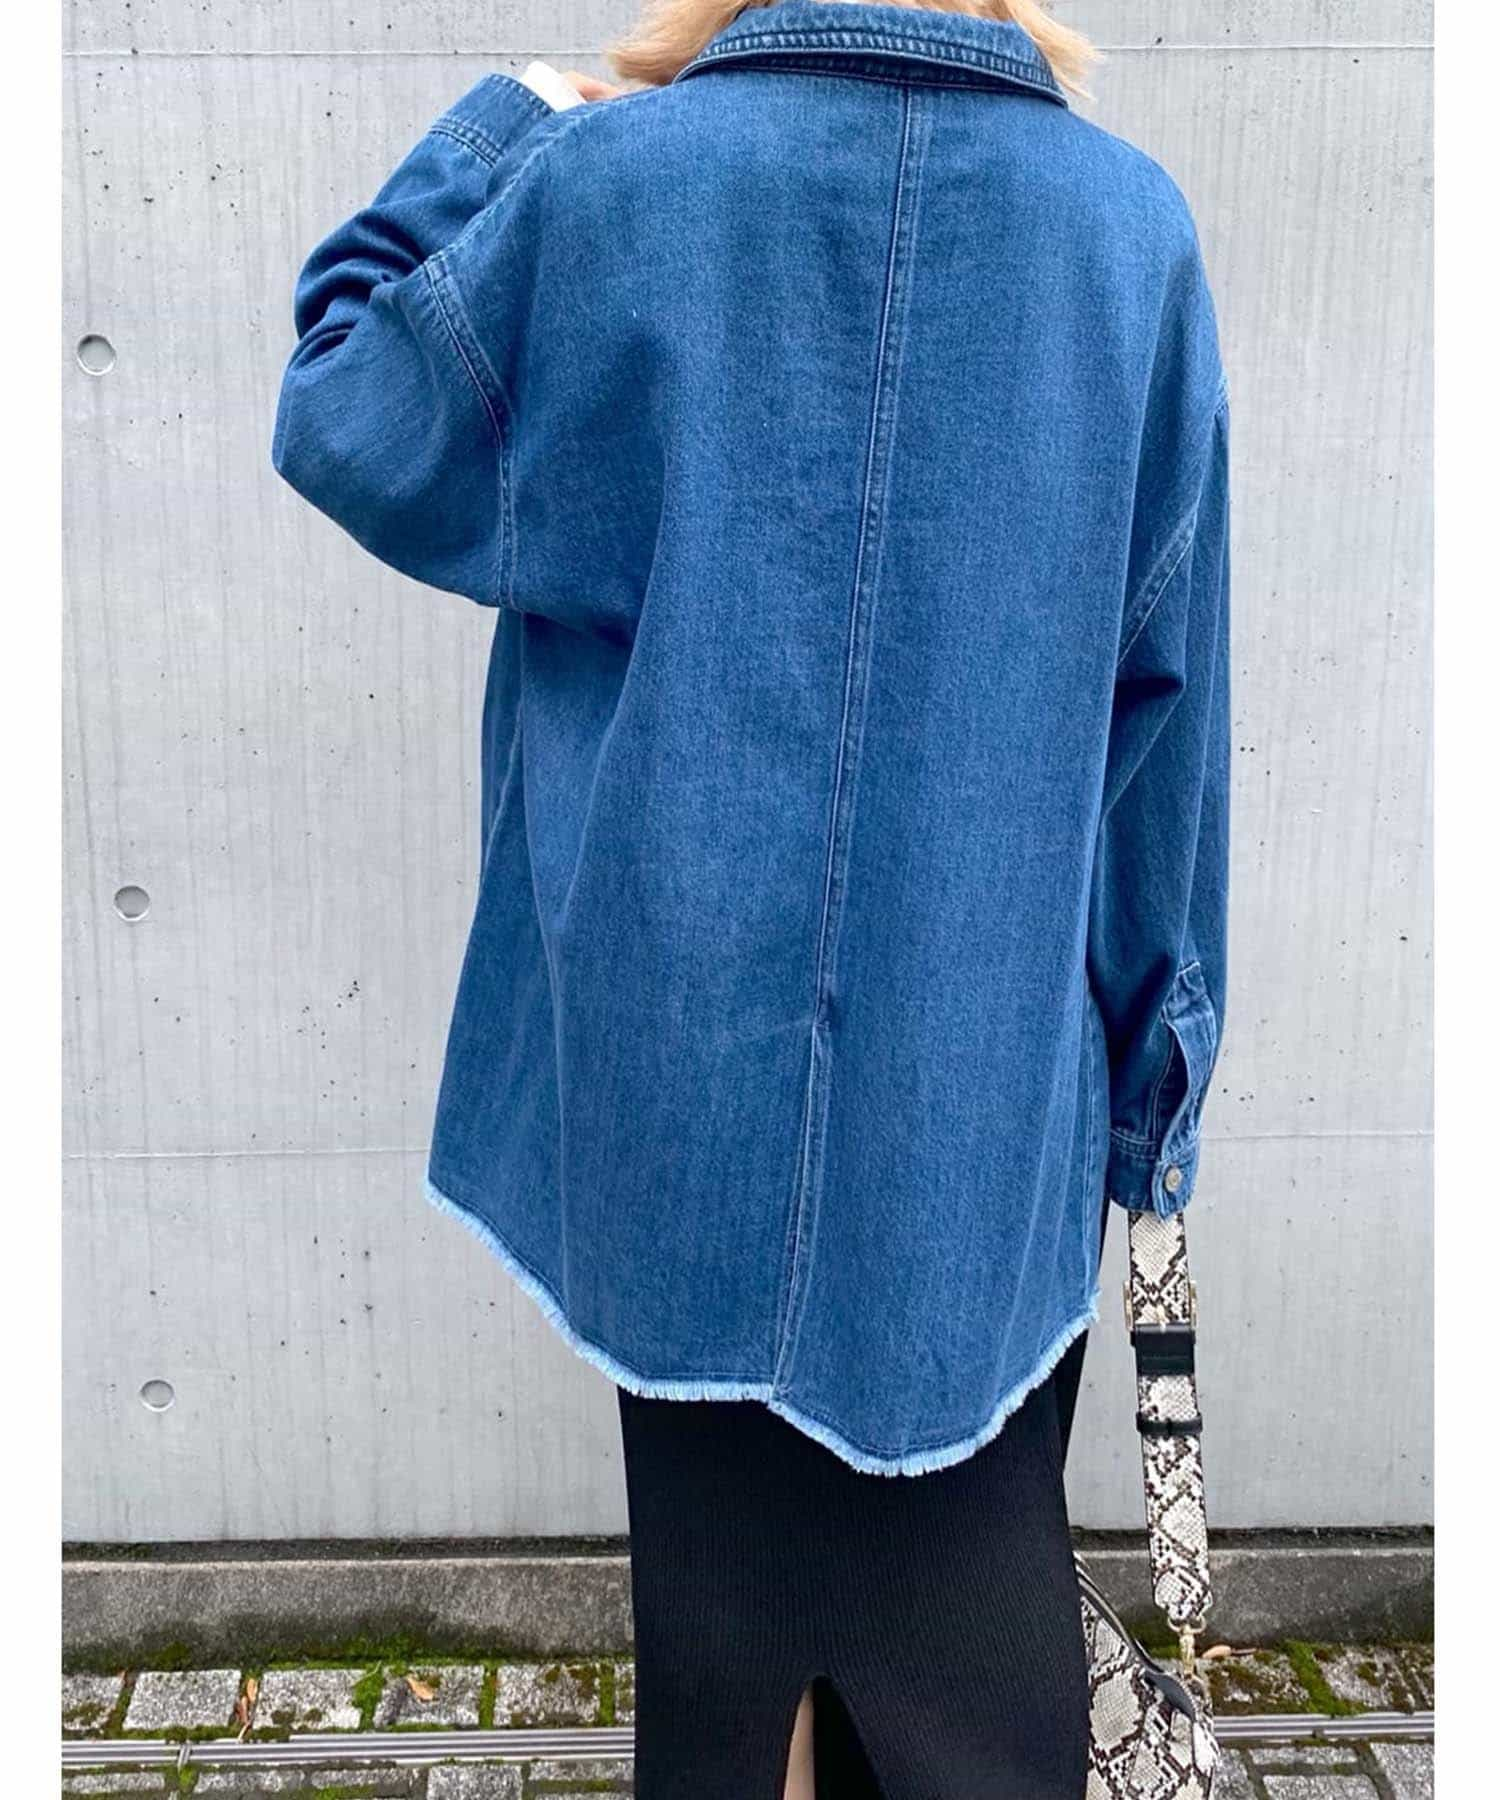 RIVE DROITE(リヴドロワ) 【ざっくり羽織るだけでこなれた印象に】ディティールデニムジャケット